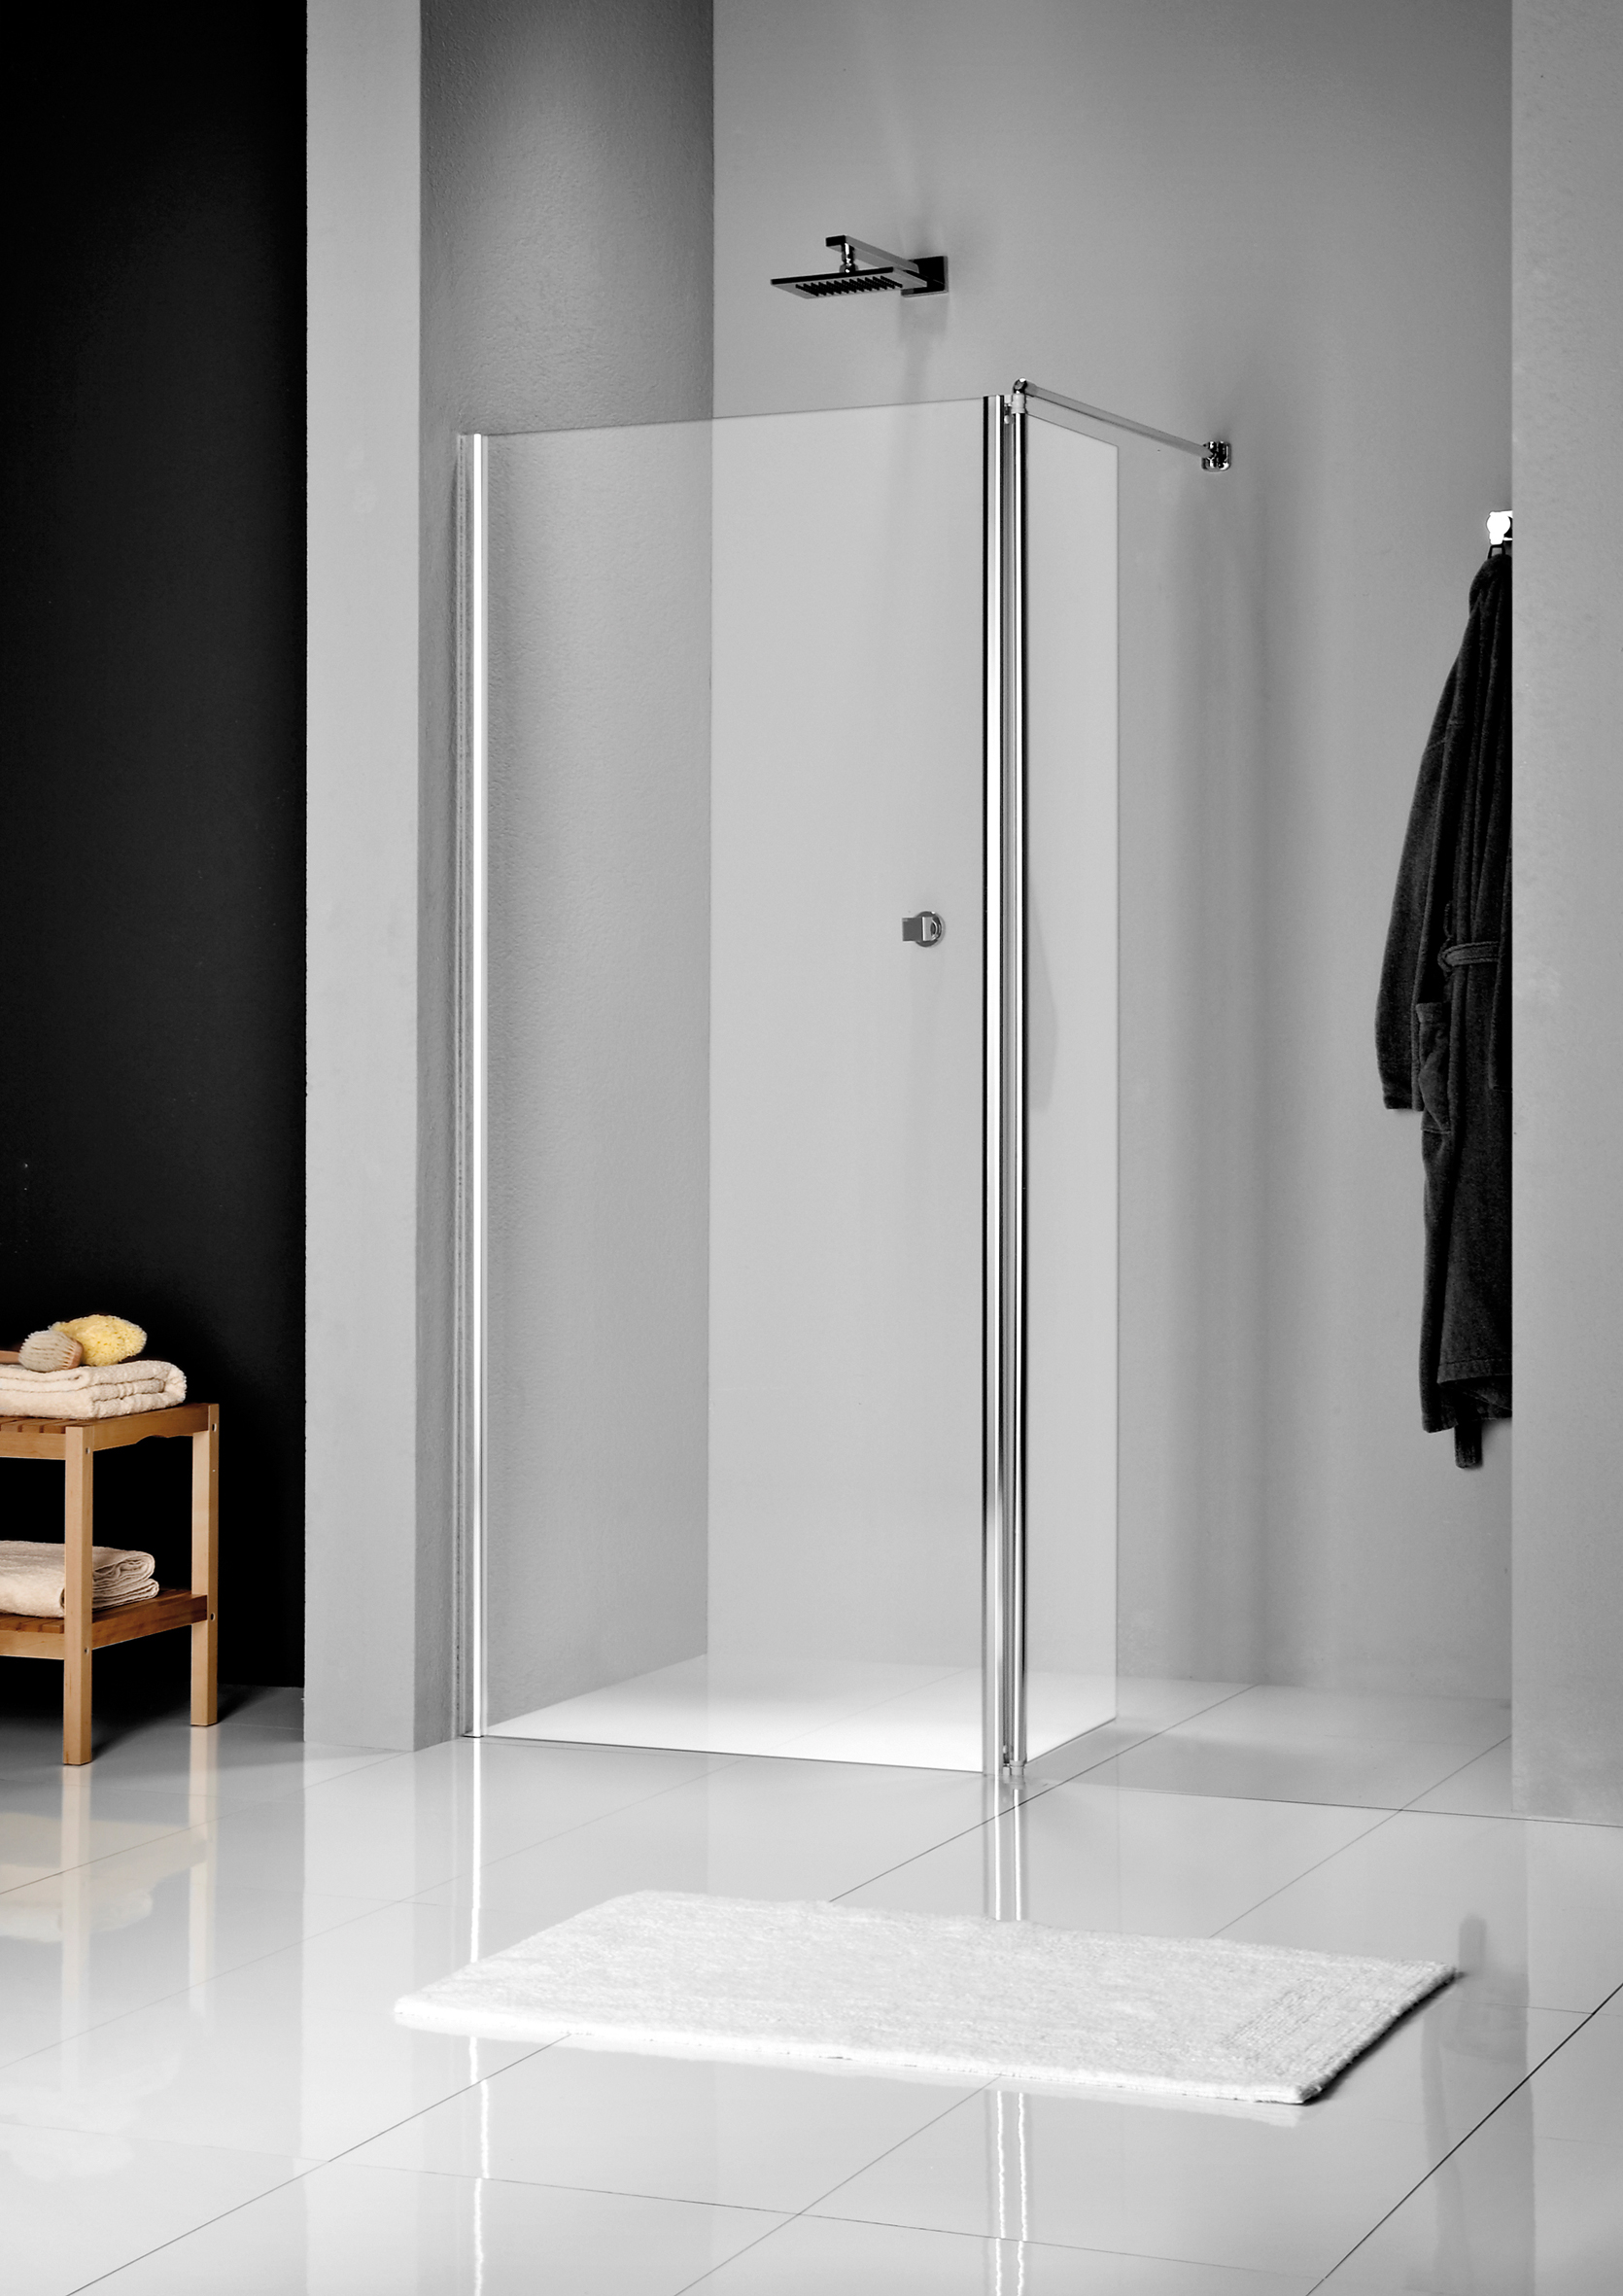 Sealskin Get Wet W205 inloop type a1 140x200cm mat zilver profiel en helder glas